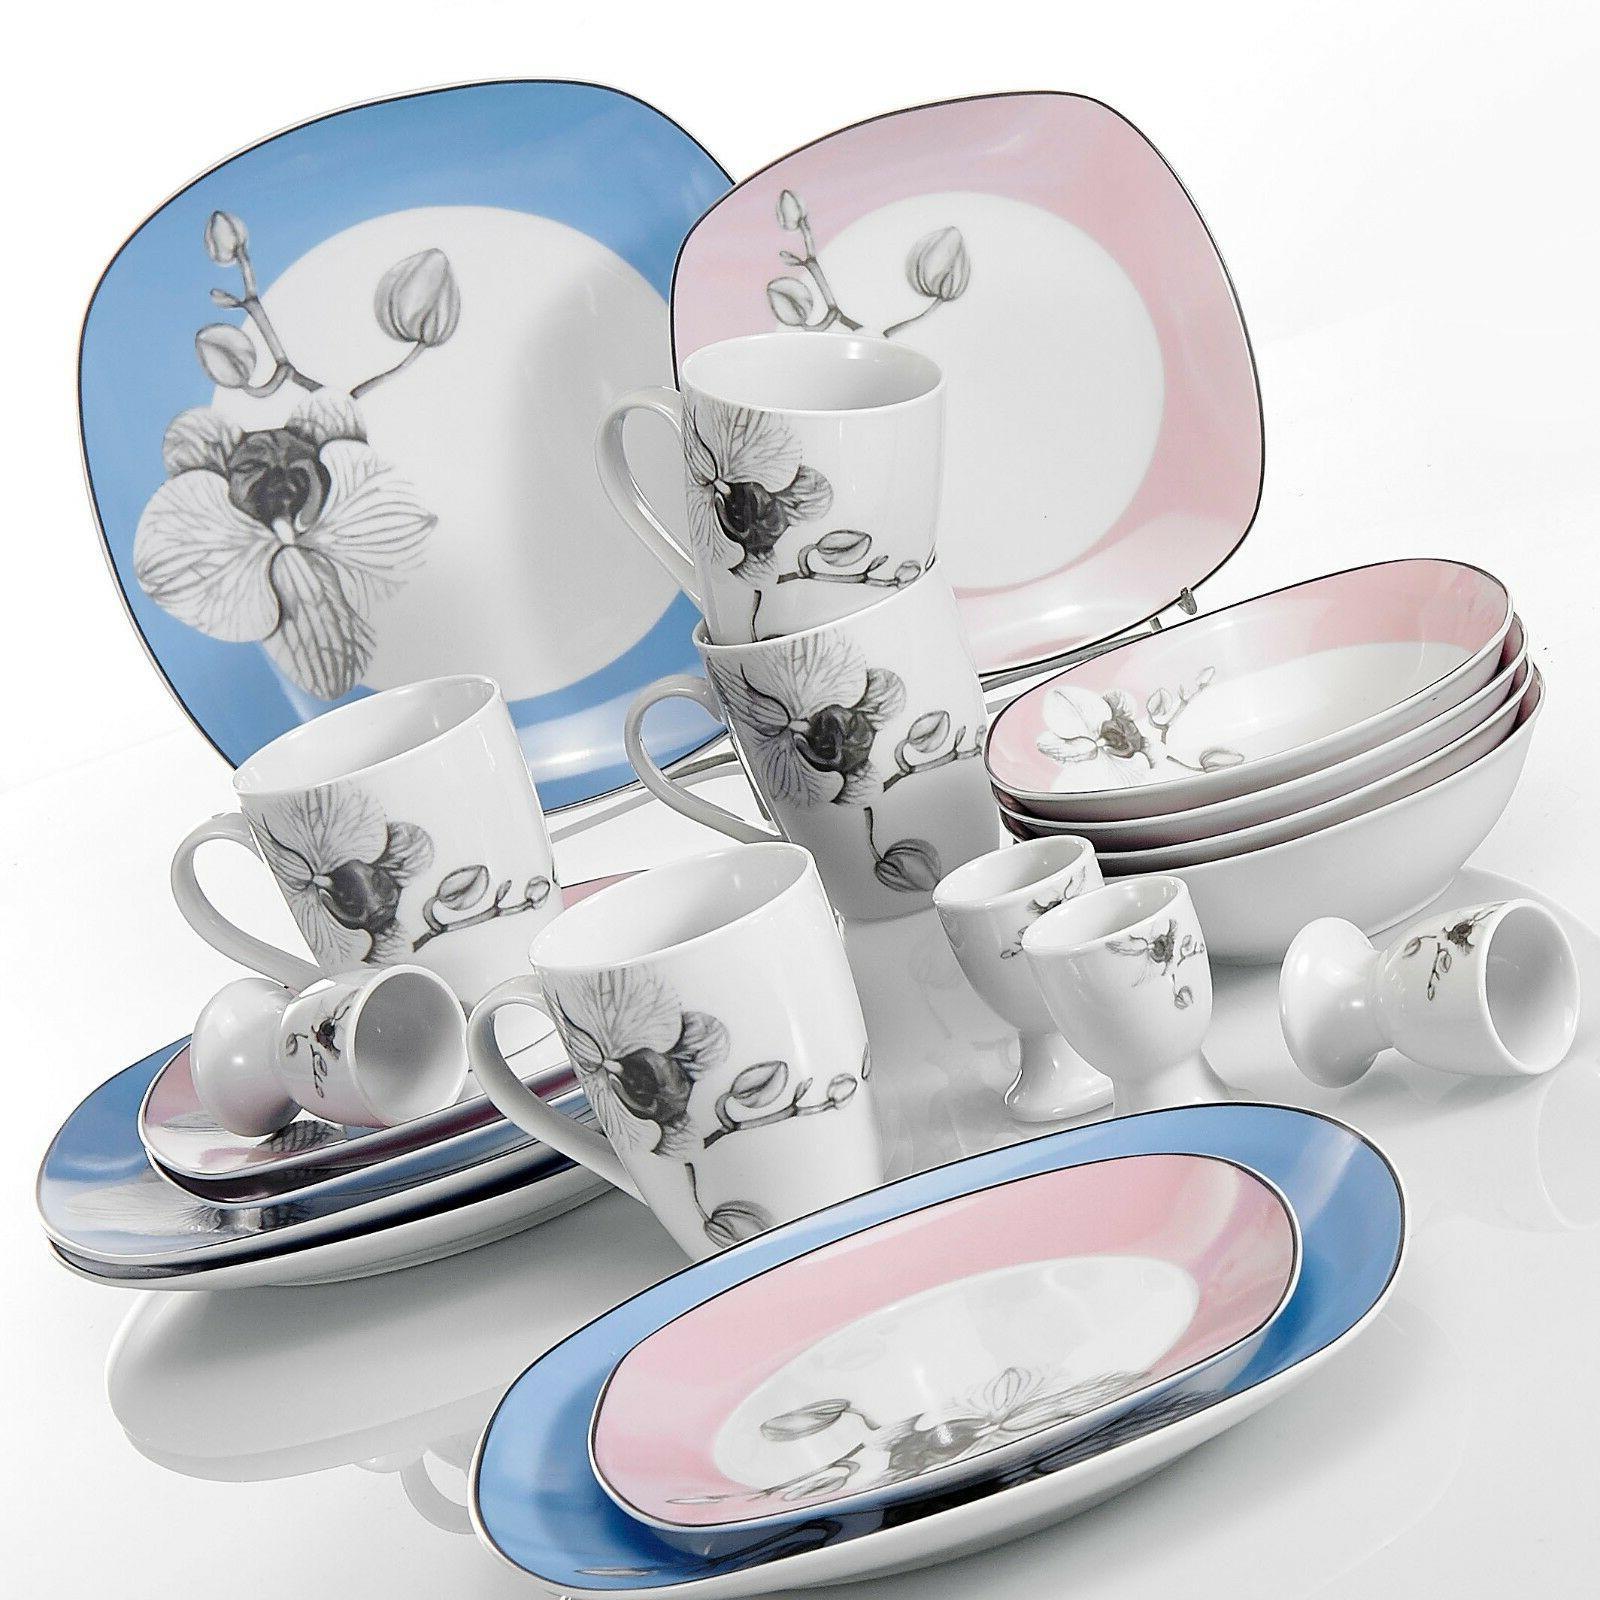 VEWEET Dinnerware color Kitchen Plate Sets